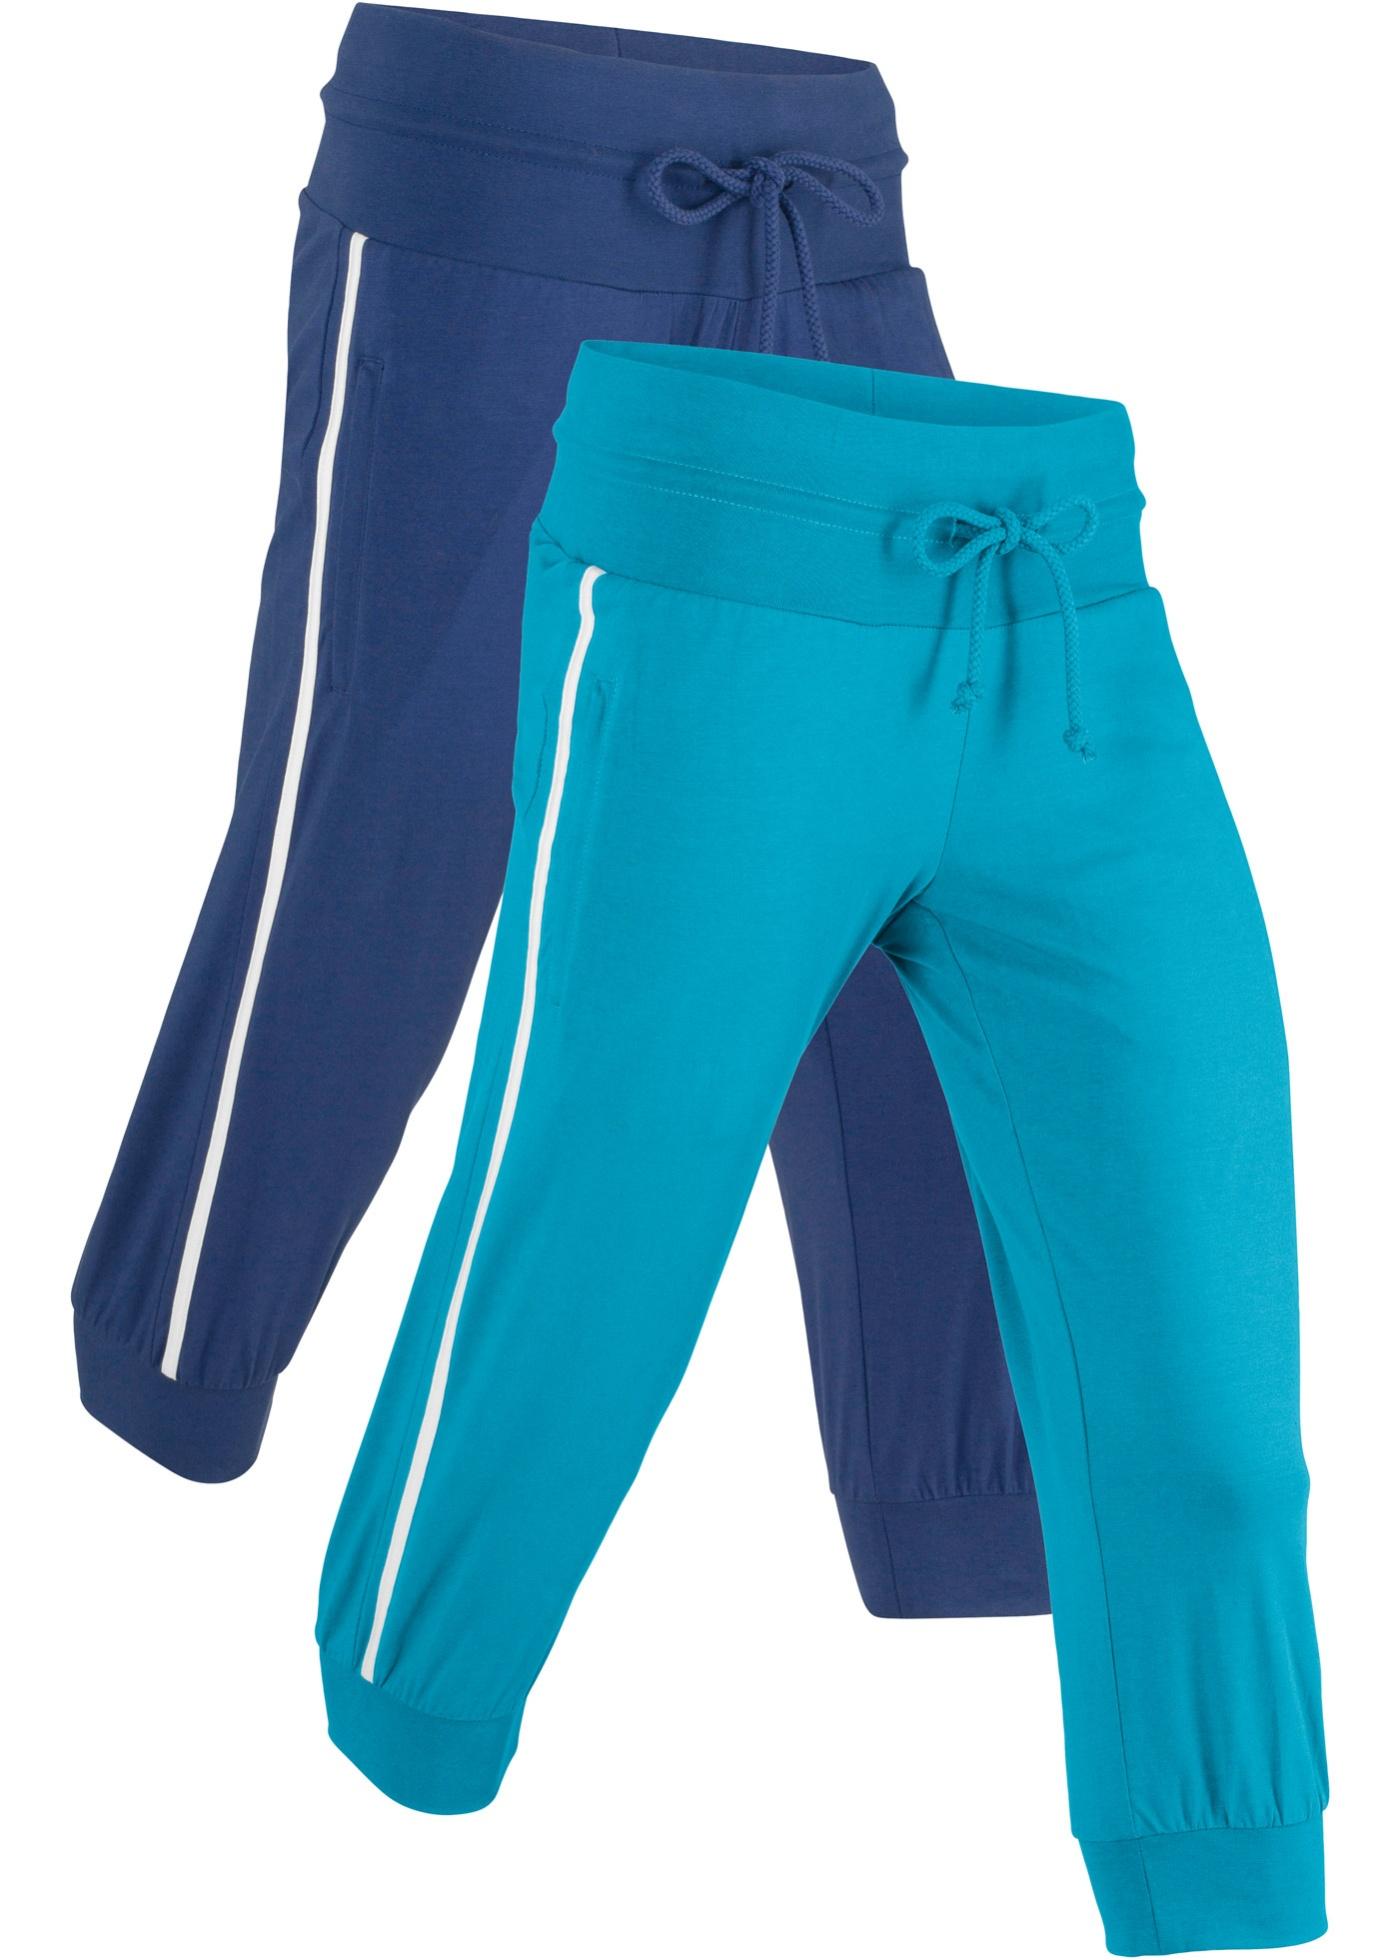 Hosen - Stretch Sport Knickerbocker (2er Pack), 3 4 Länge, Level 1 › bonprix › blau  - Onlineshop Bonprix